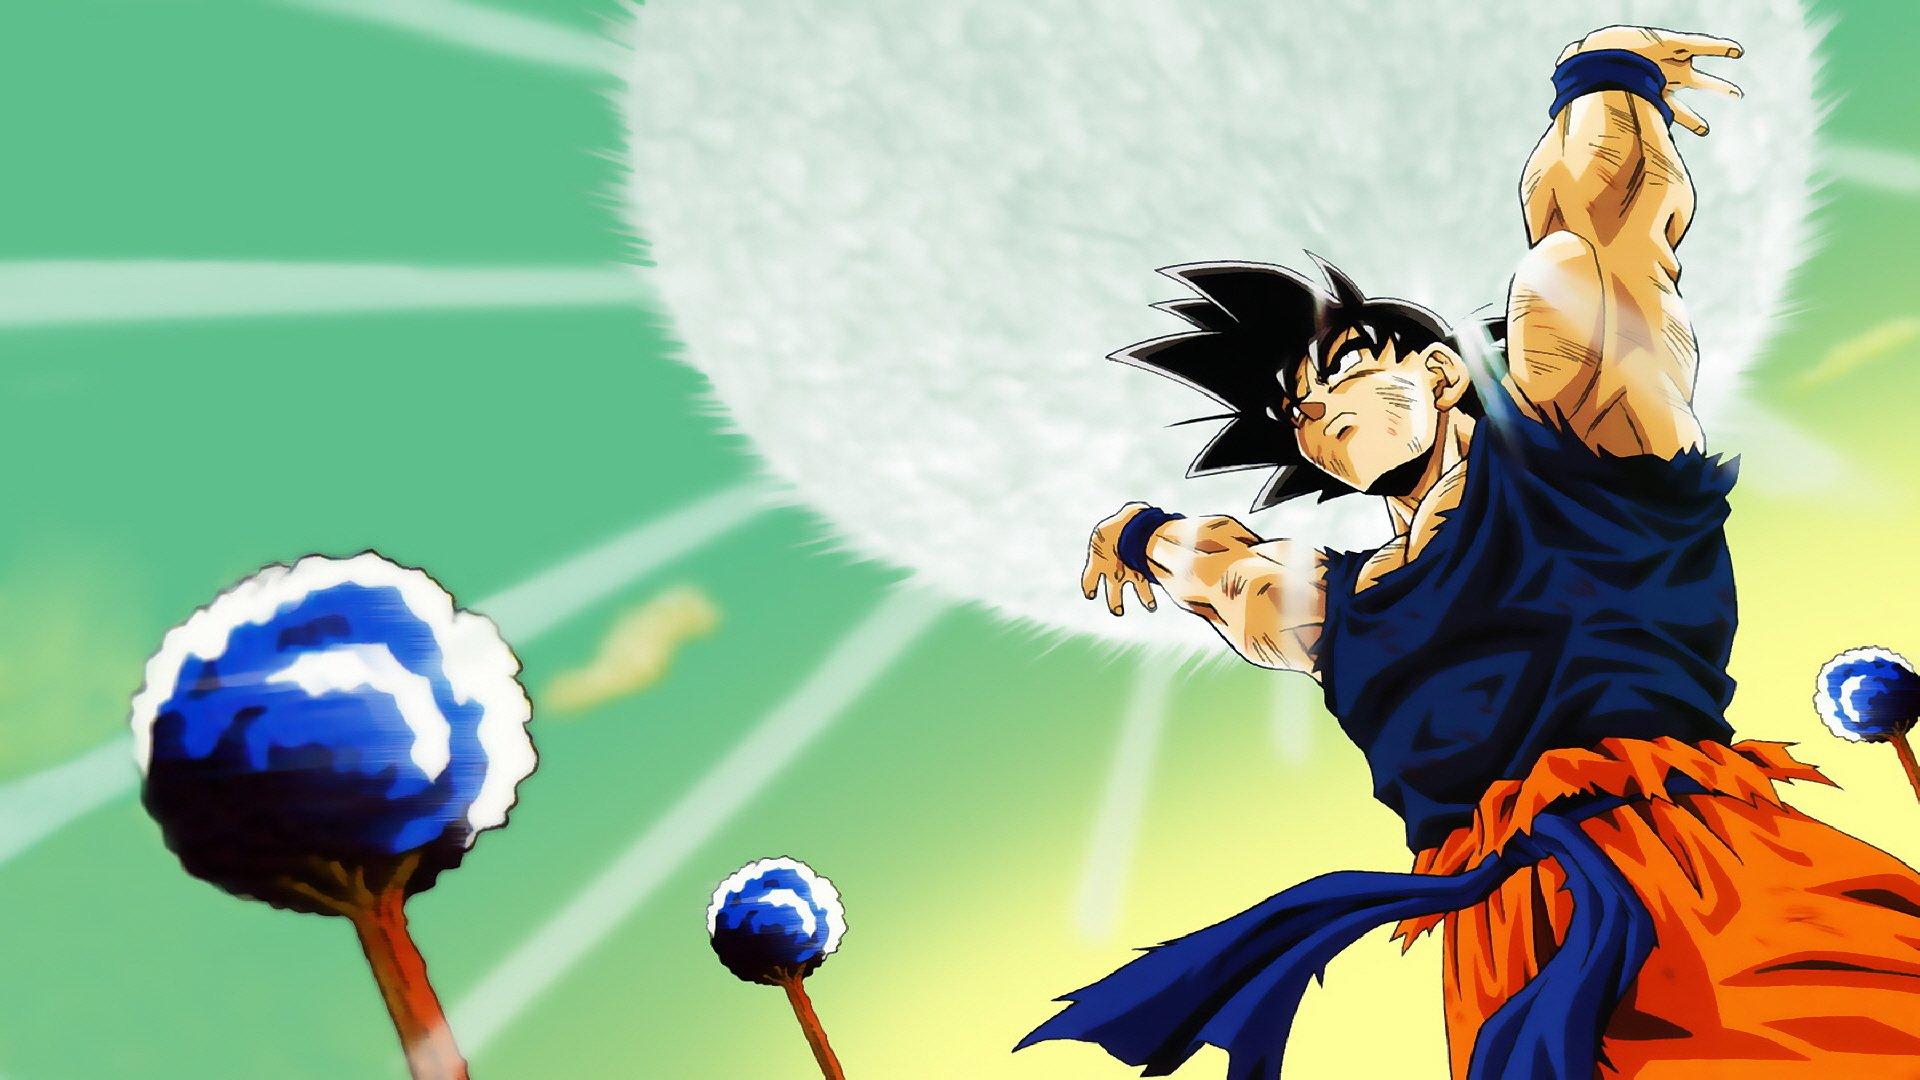 Gokus Spirit Bomb Hd Wallpaper Background Image 1920x1080 Id